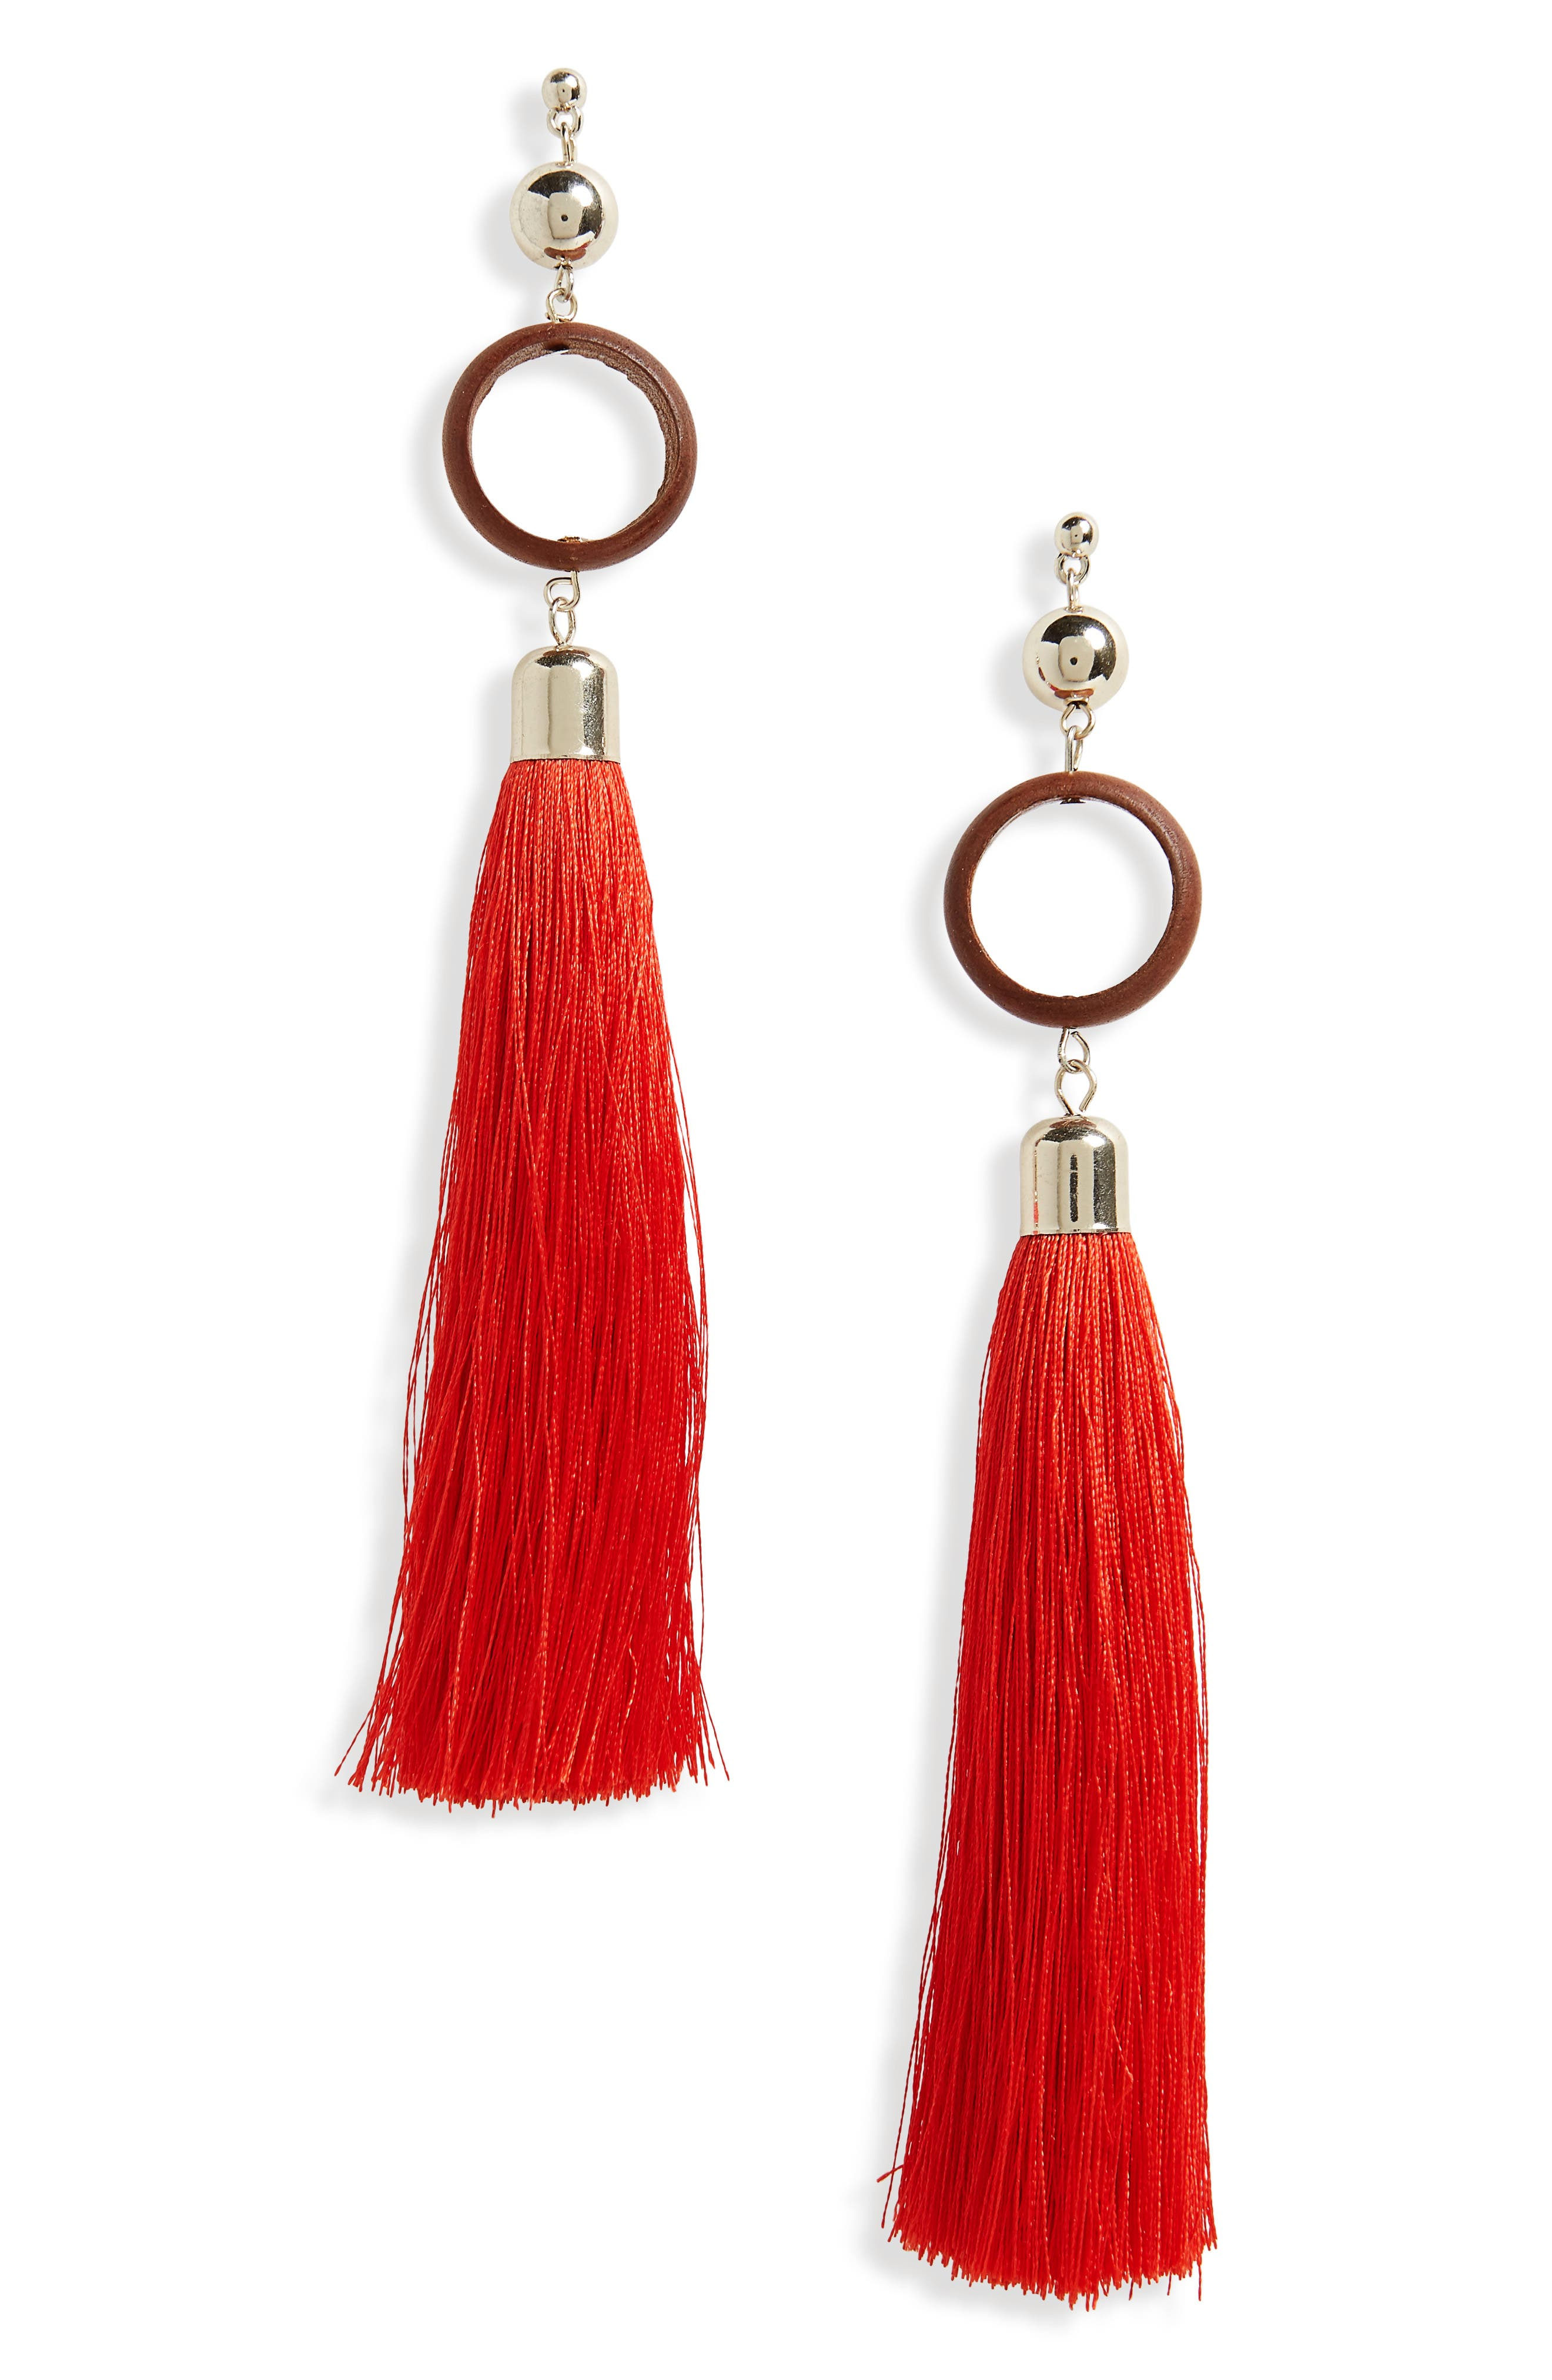 Wood Circle Tassel Earrings,                             Main thumbnail 1, color,                             Red